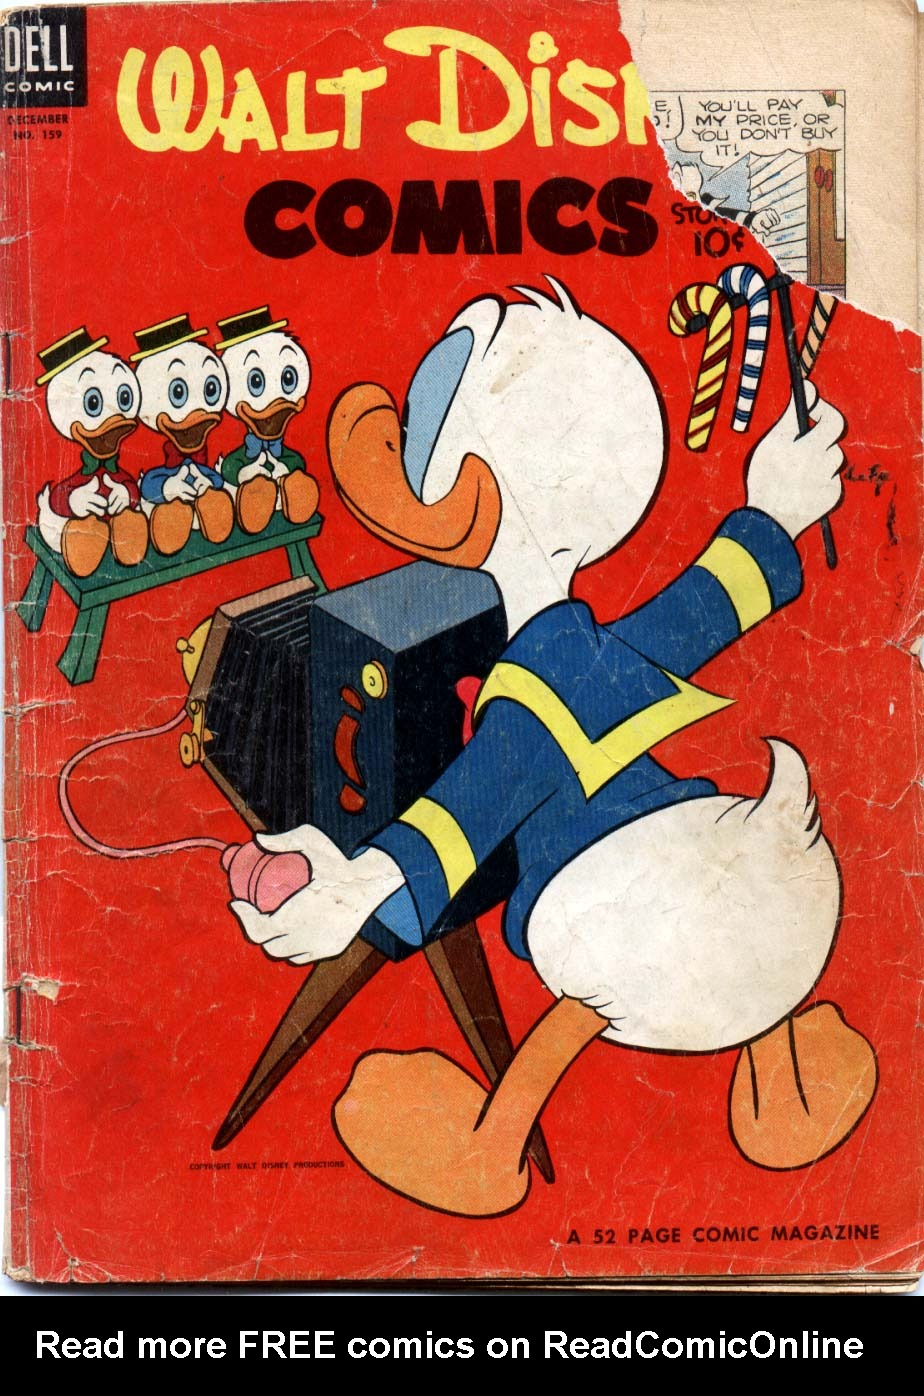 Walt Disneys Comics and Stories 159 Page 1